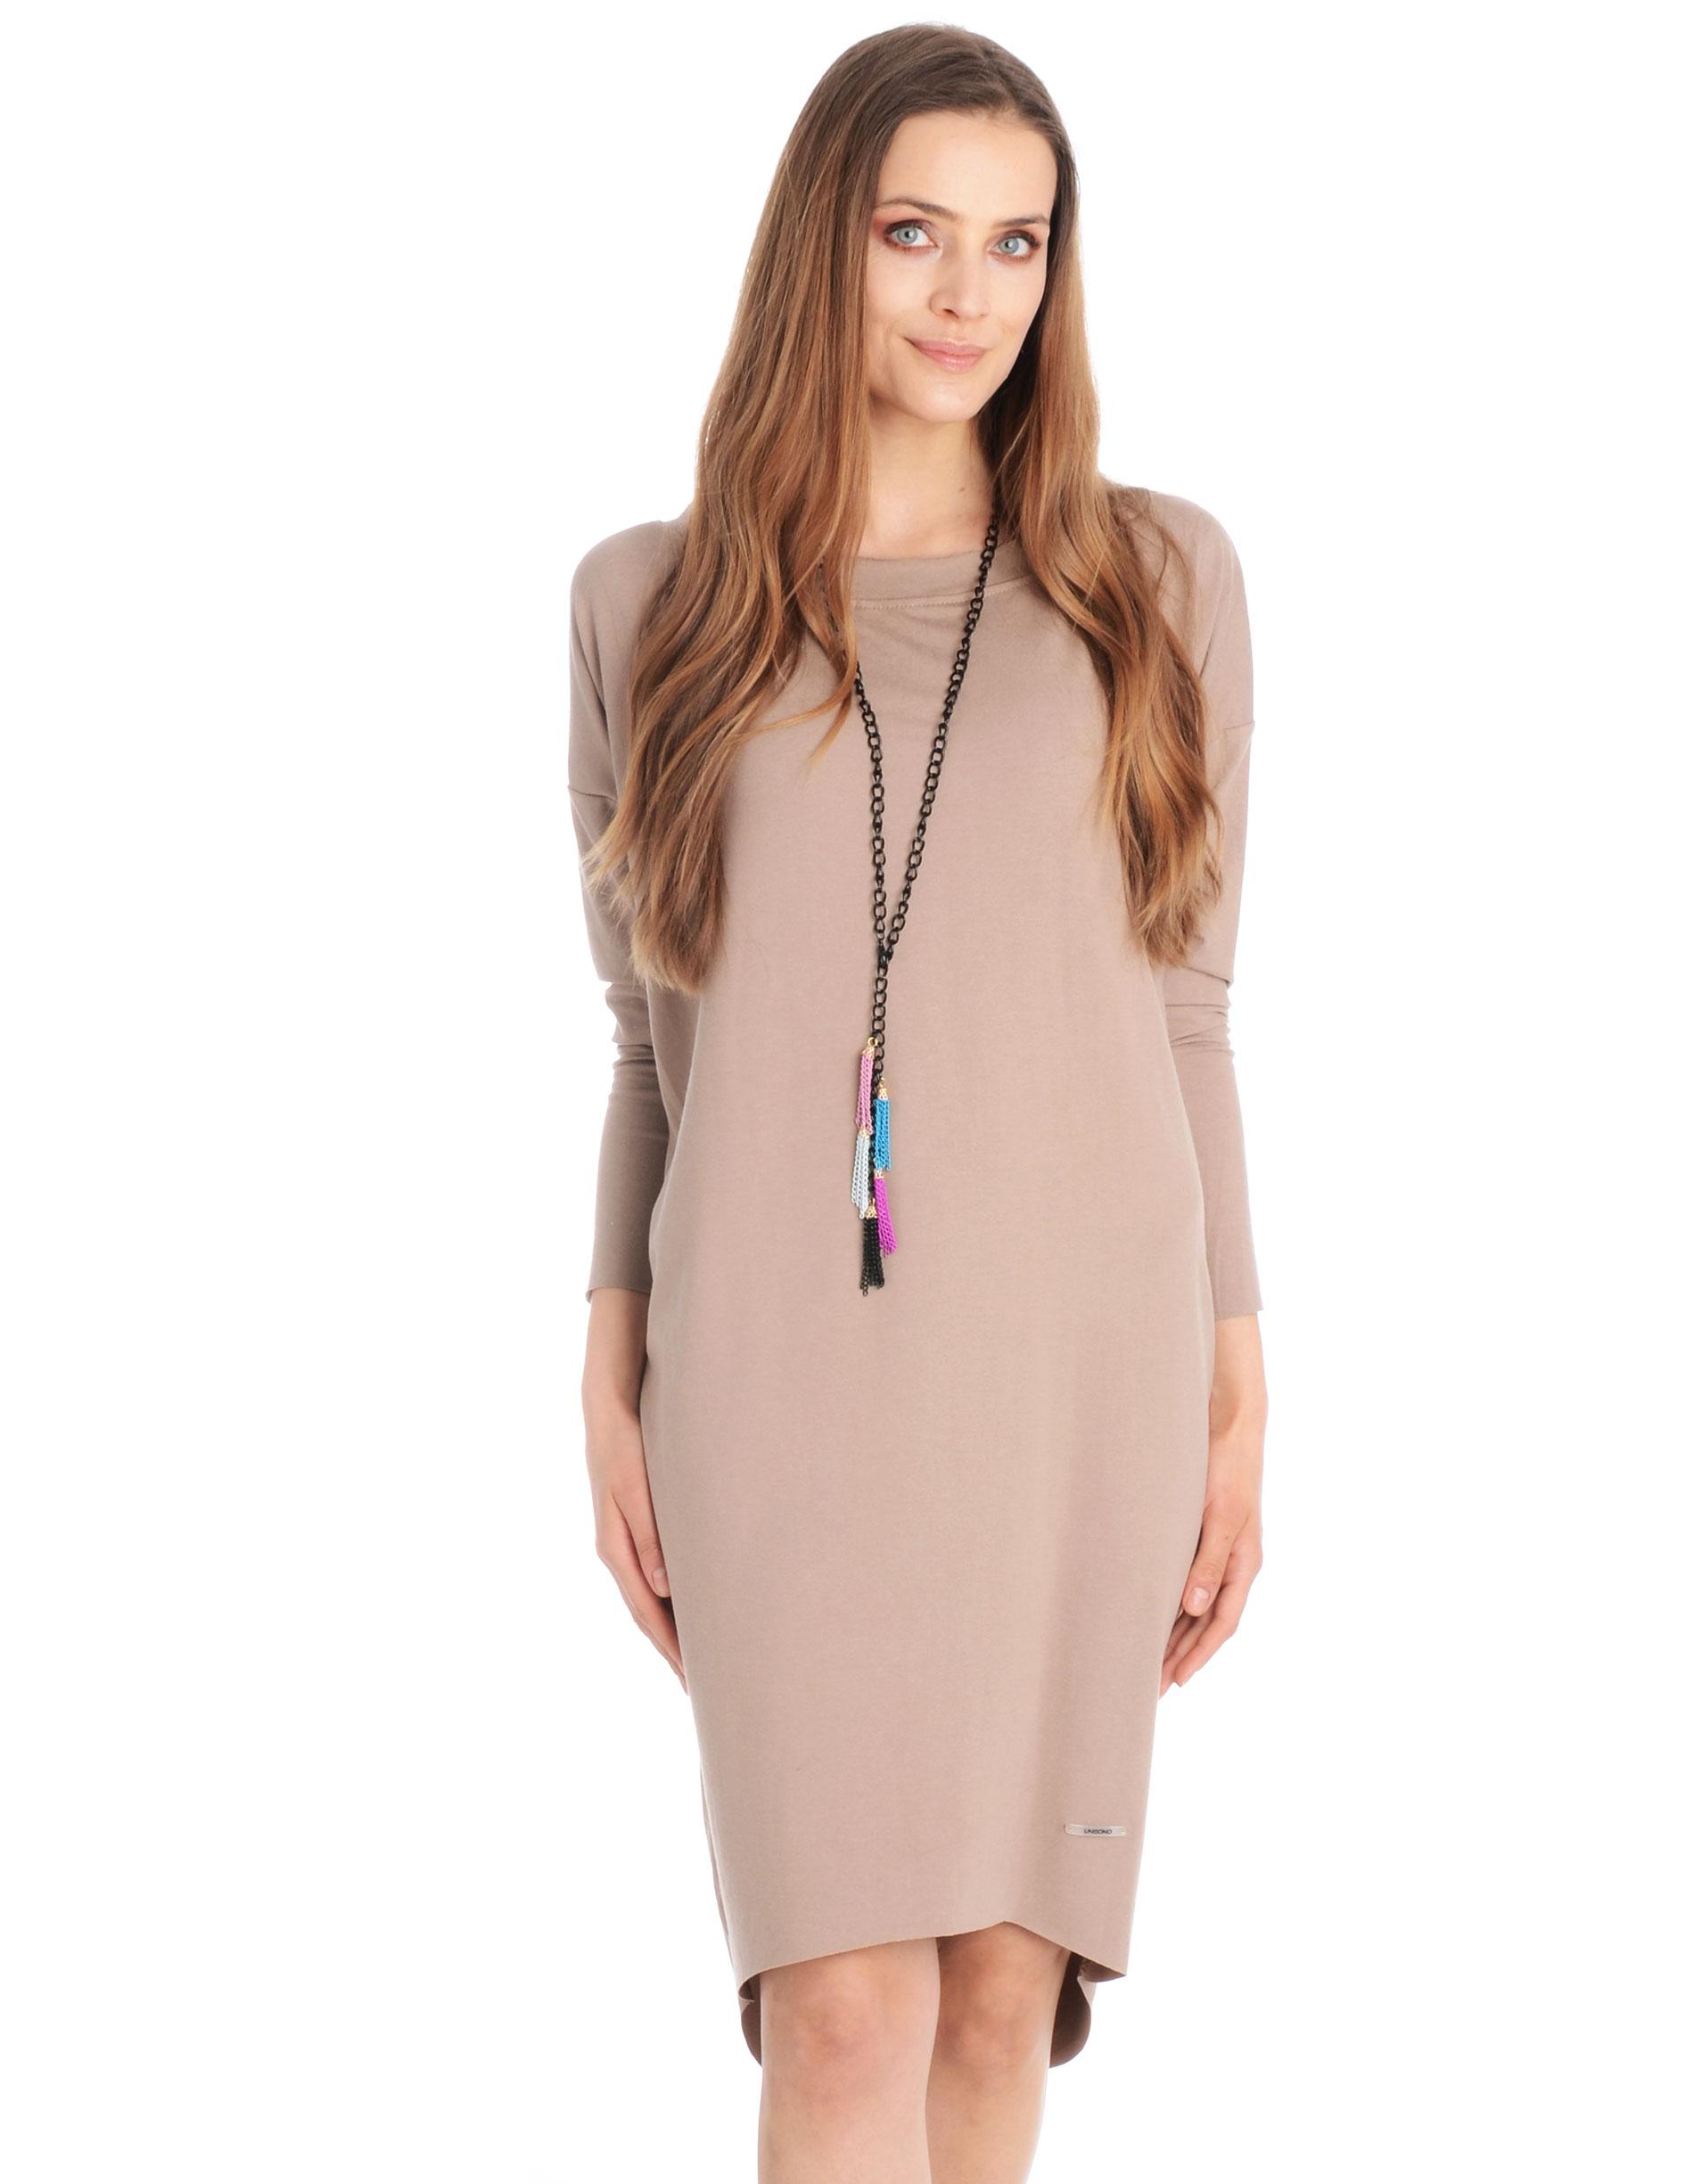 Sukienka - 30-86237 BEIG - Unisono